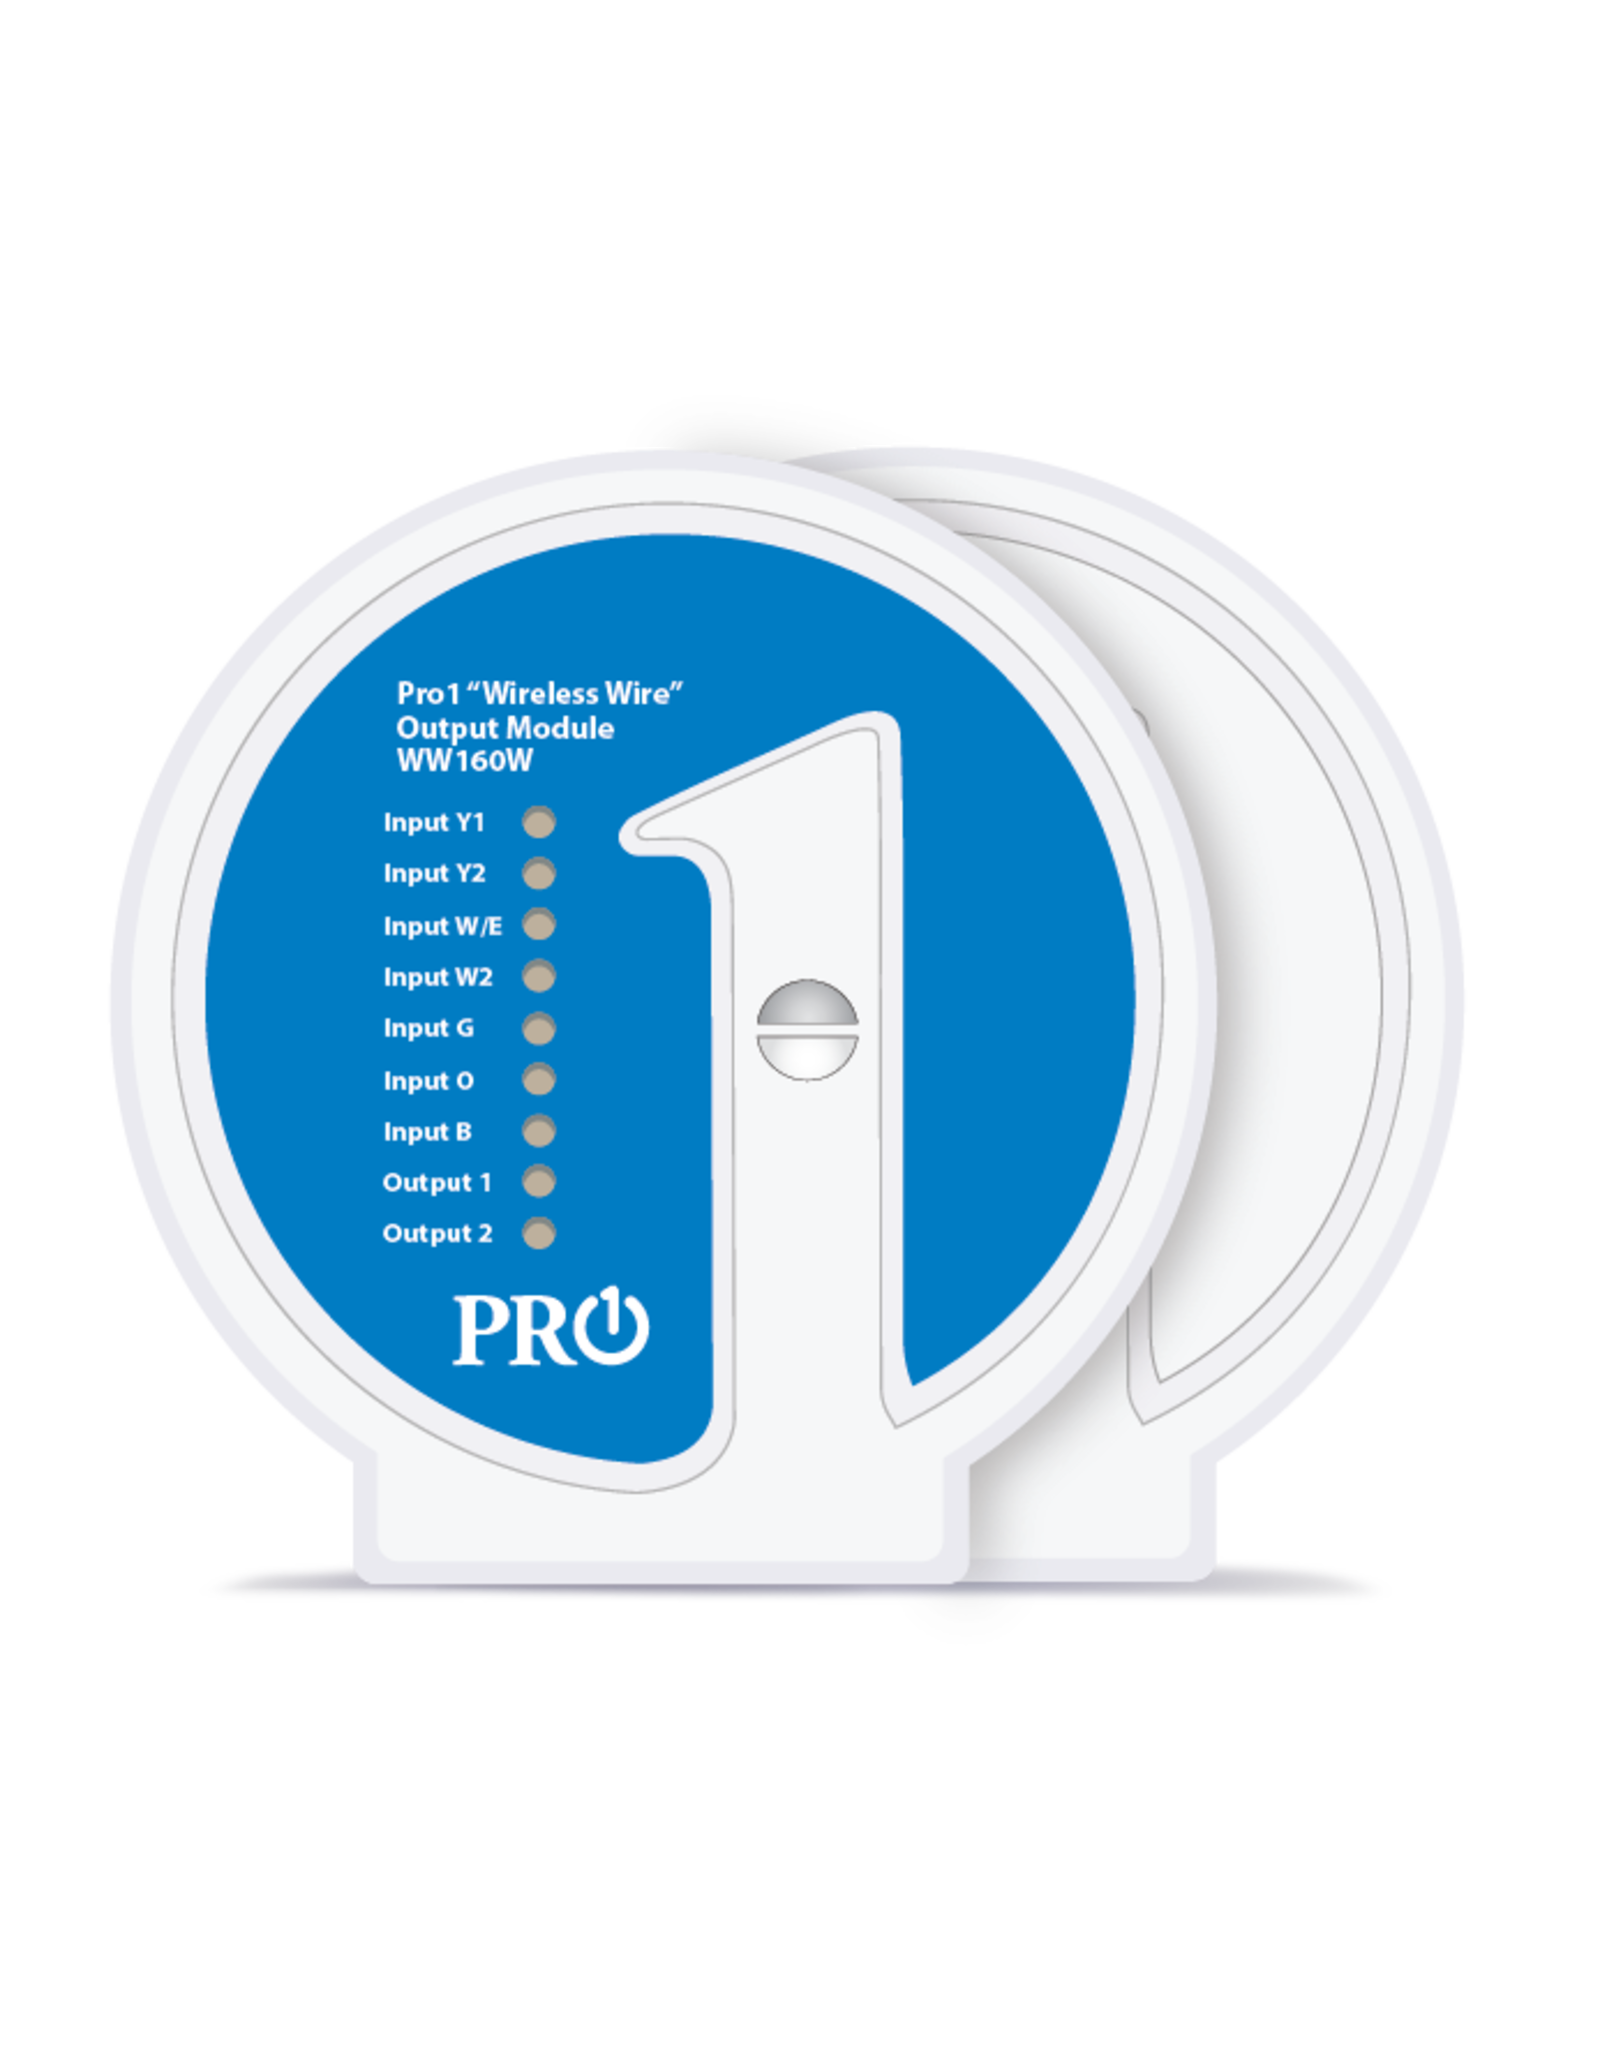 Pro1 Wireless Wire